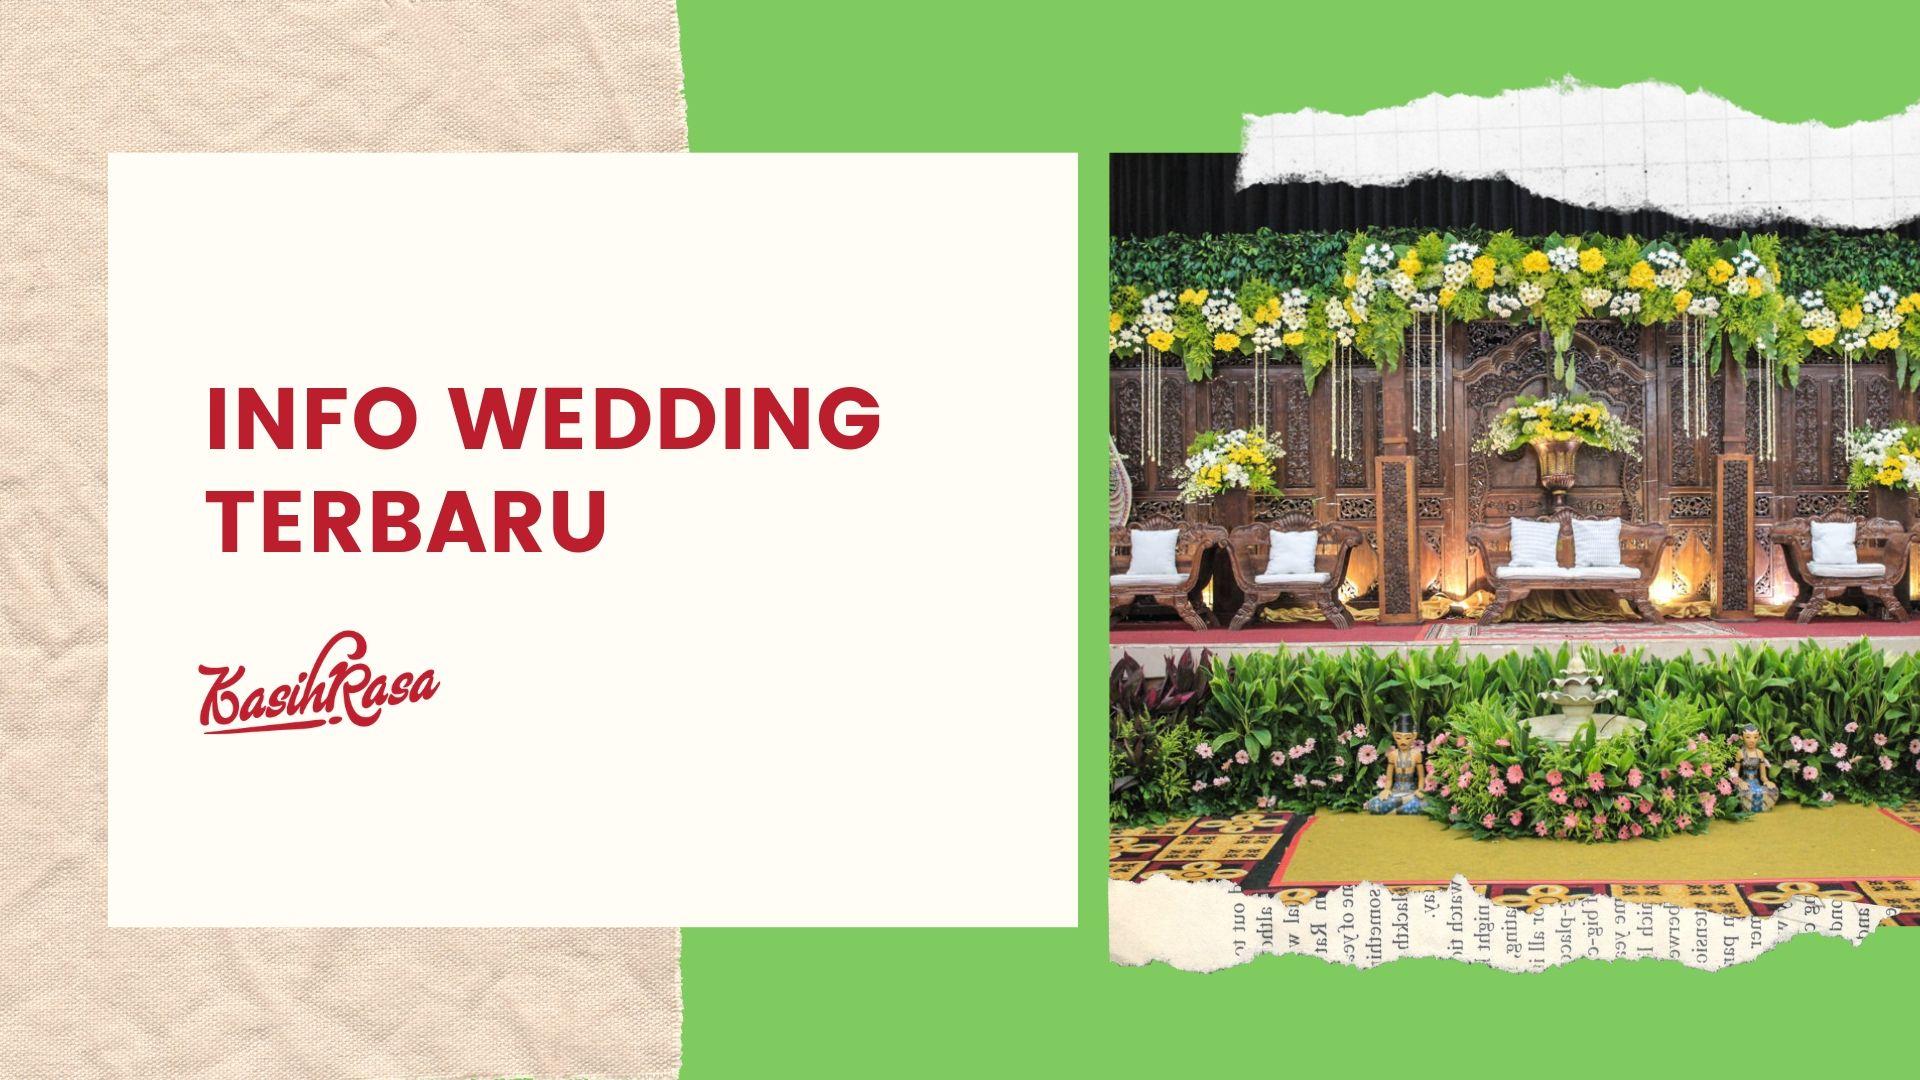 Rekomendasi Wedding Organizer Terpercaya di Jakarta 2019 adalah yang menyiapkan paket pernikahan di jakarta kelengkapan yang di perlukan oleh kedua pengantin